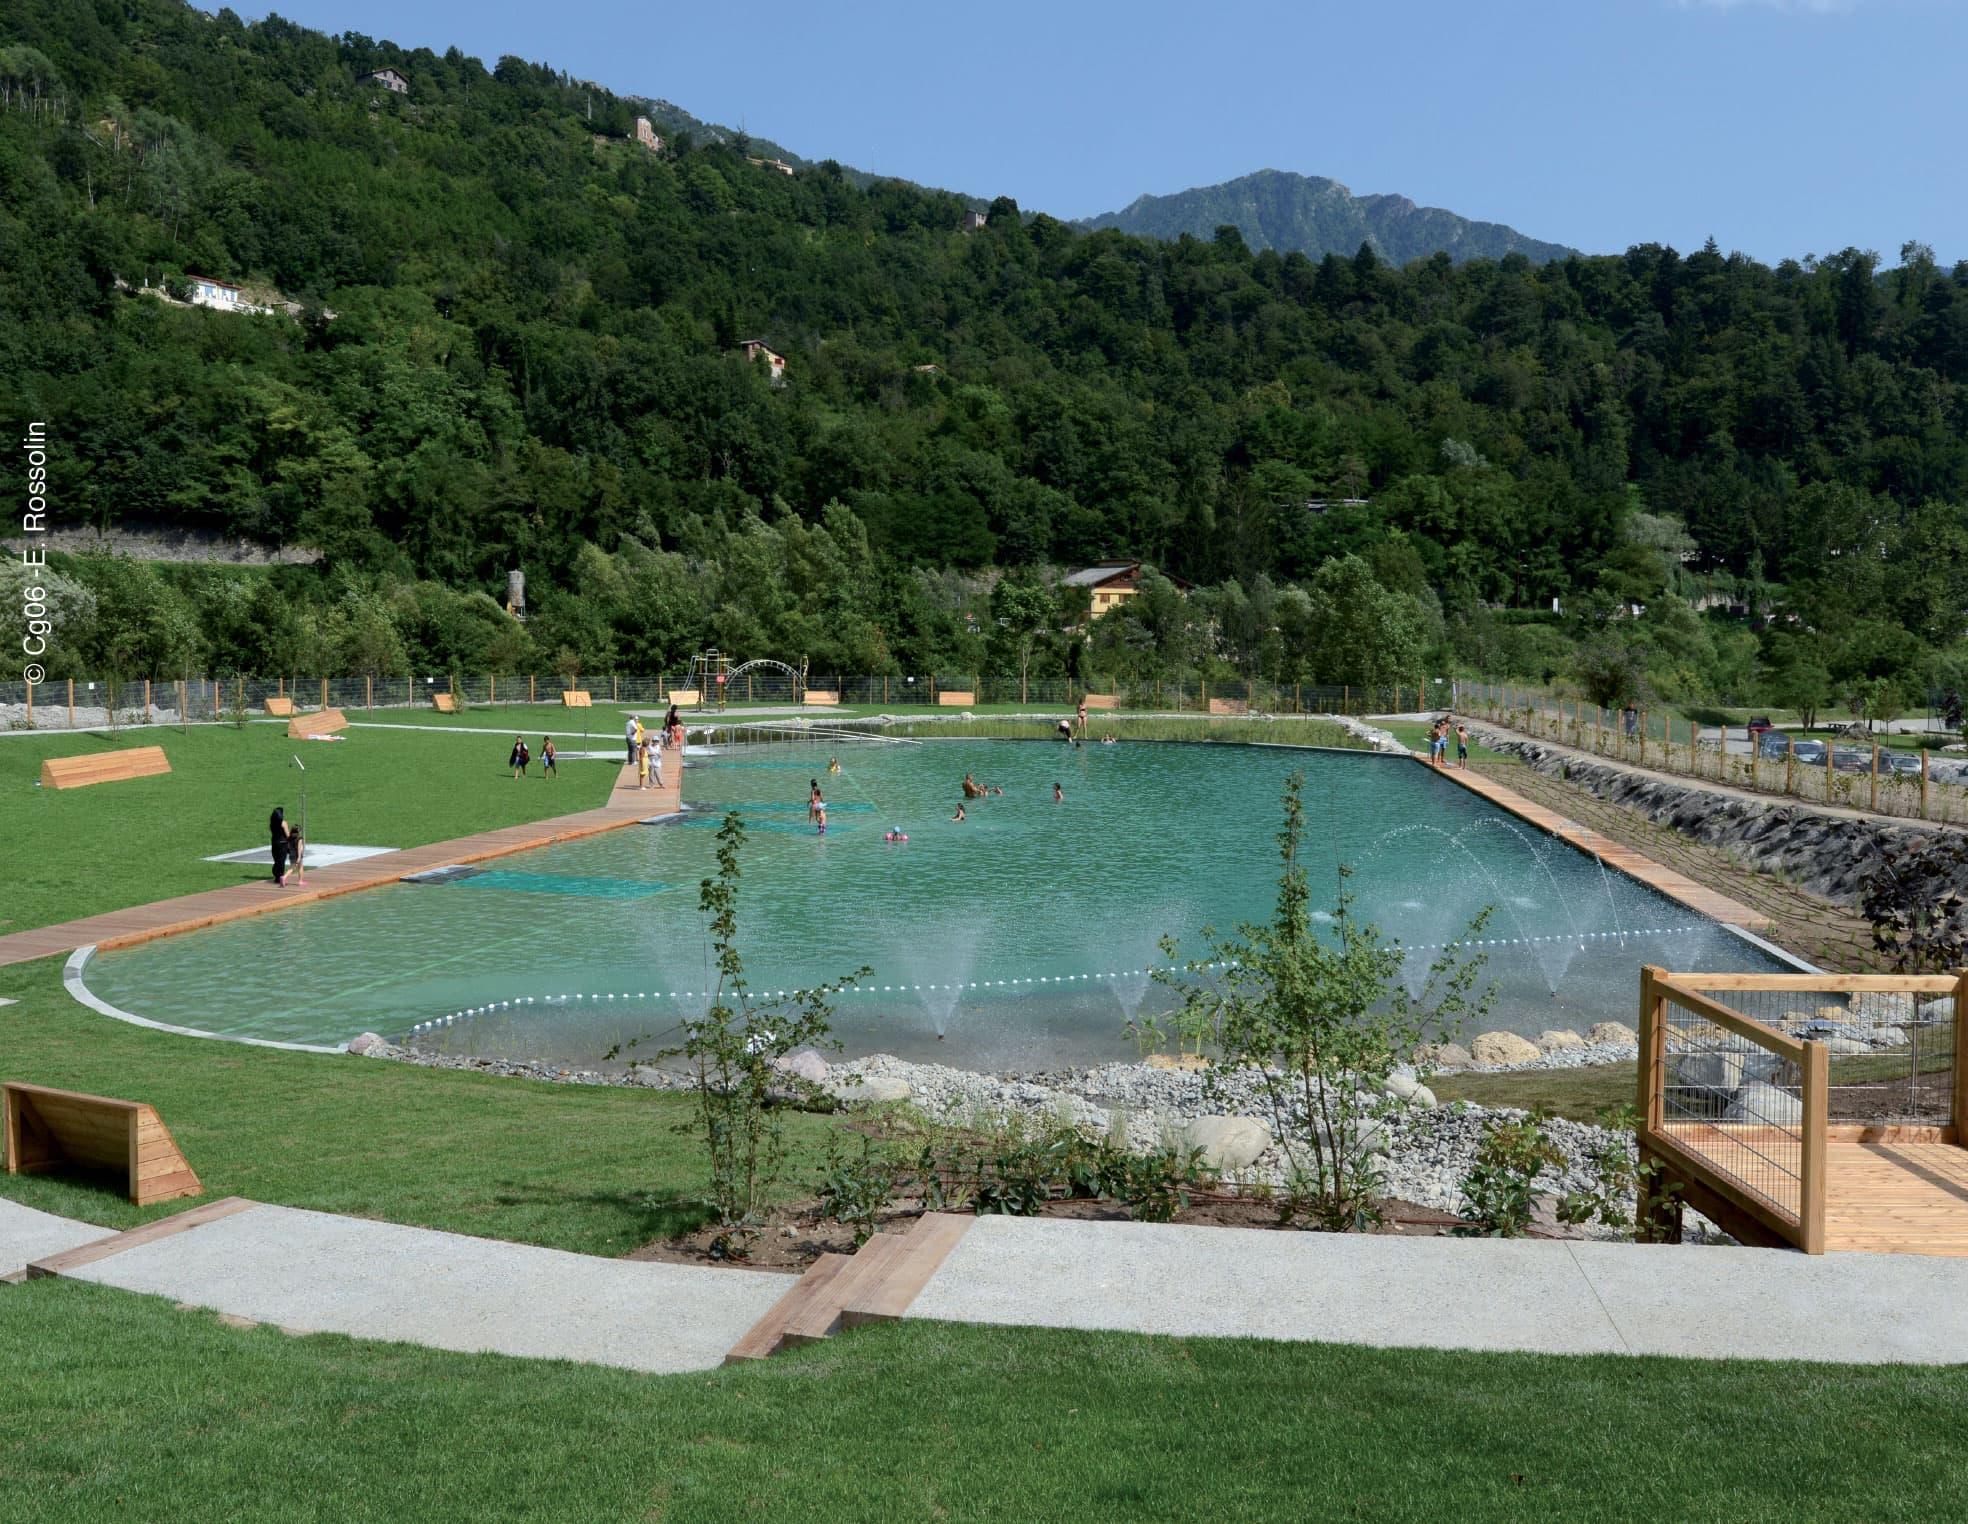 Roquebilli re thermale - Bassin baignade biologique bordeaux ...